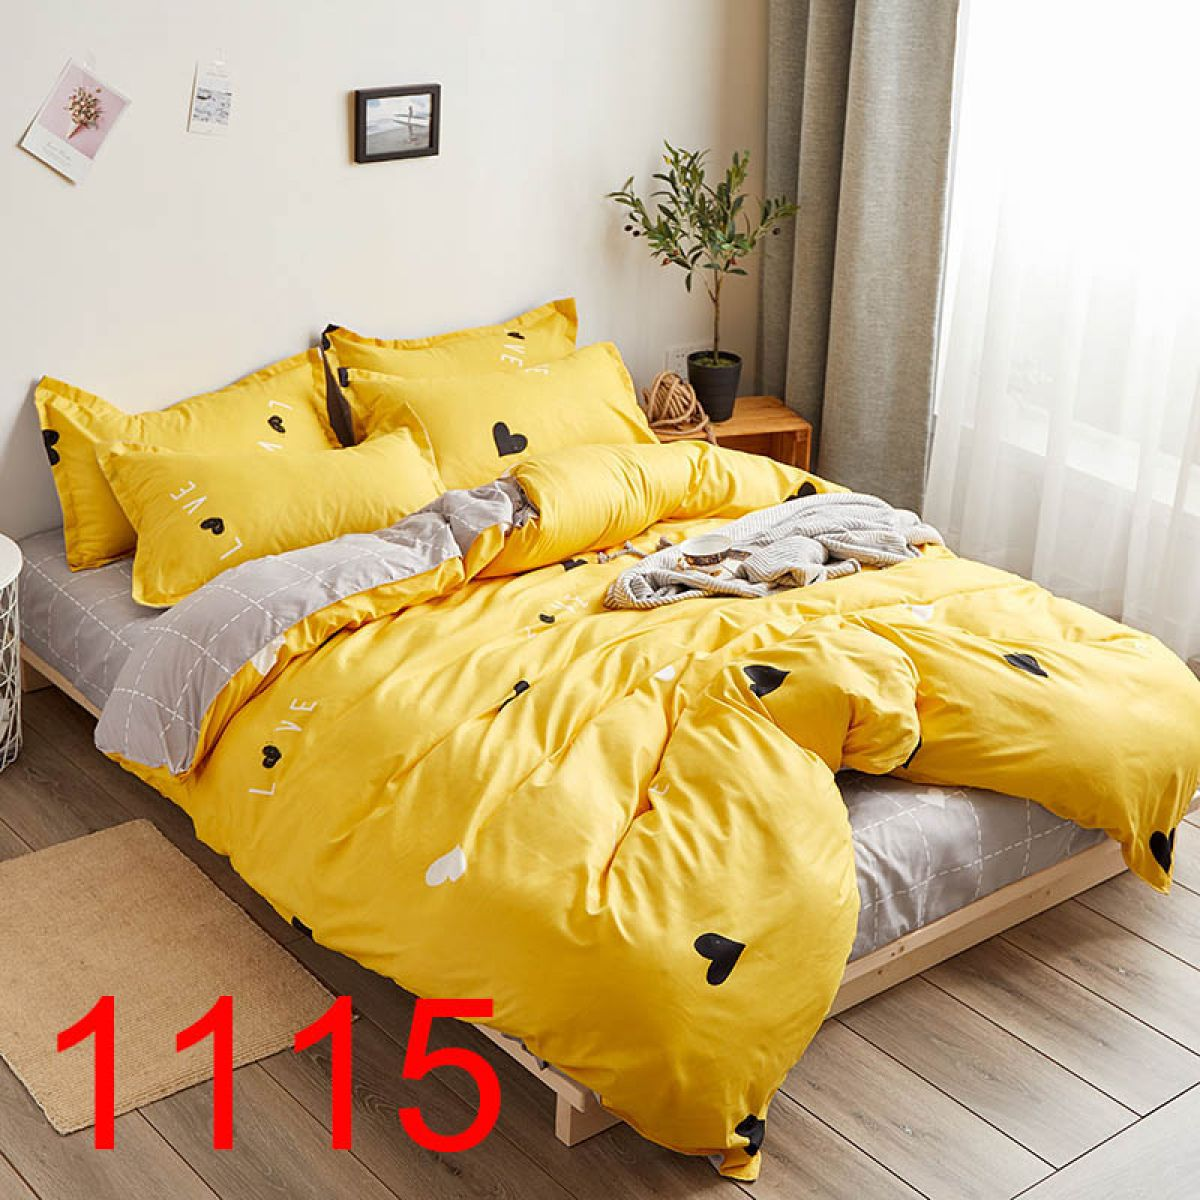 Double-sided Beddings - FBC-8055 - 220x200 cm - 3 pcs